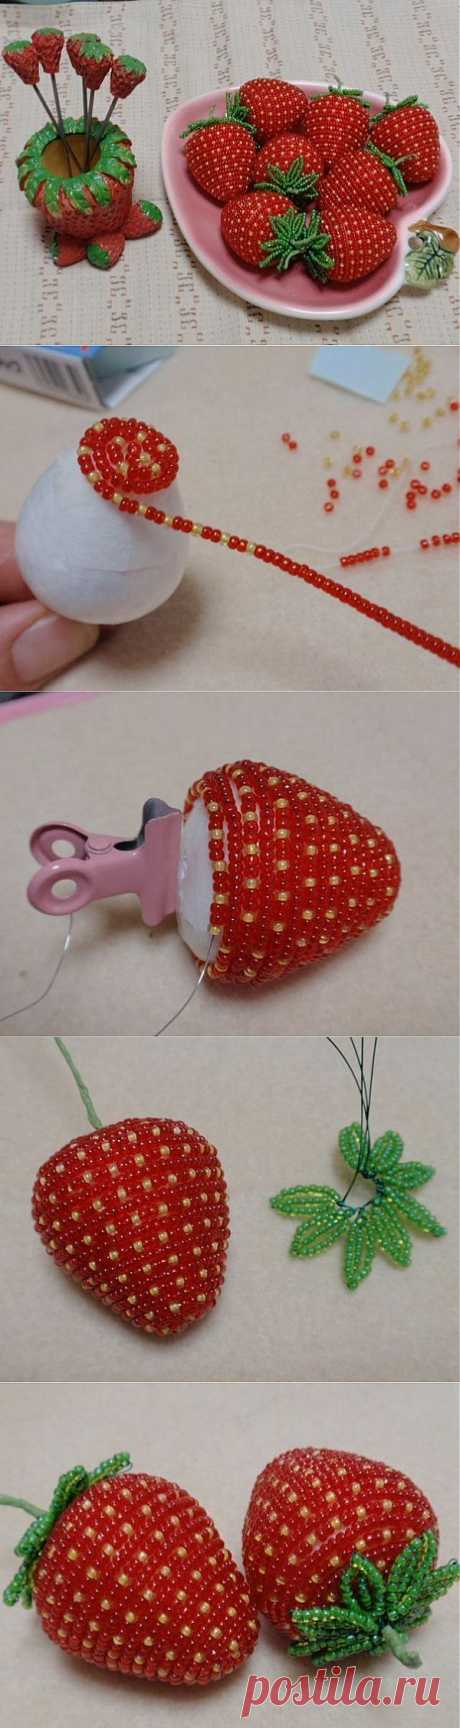 Beaded strawberry. Unique handmade beaded jewelry | Laboratory household